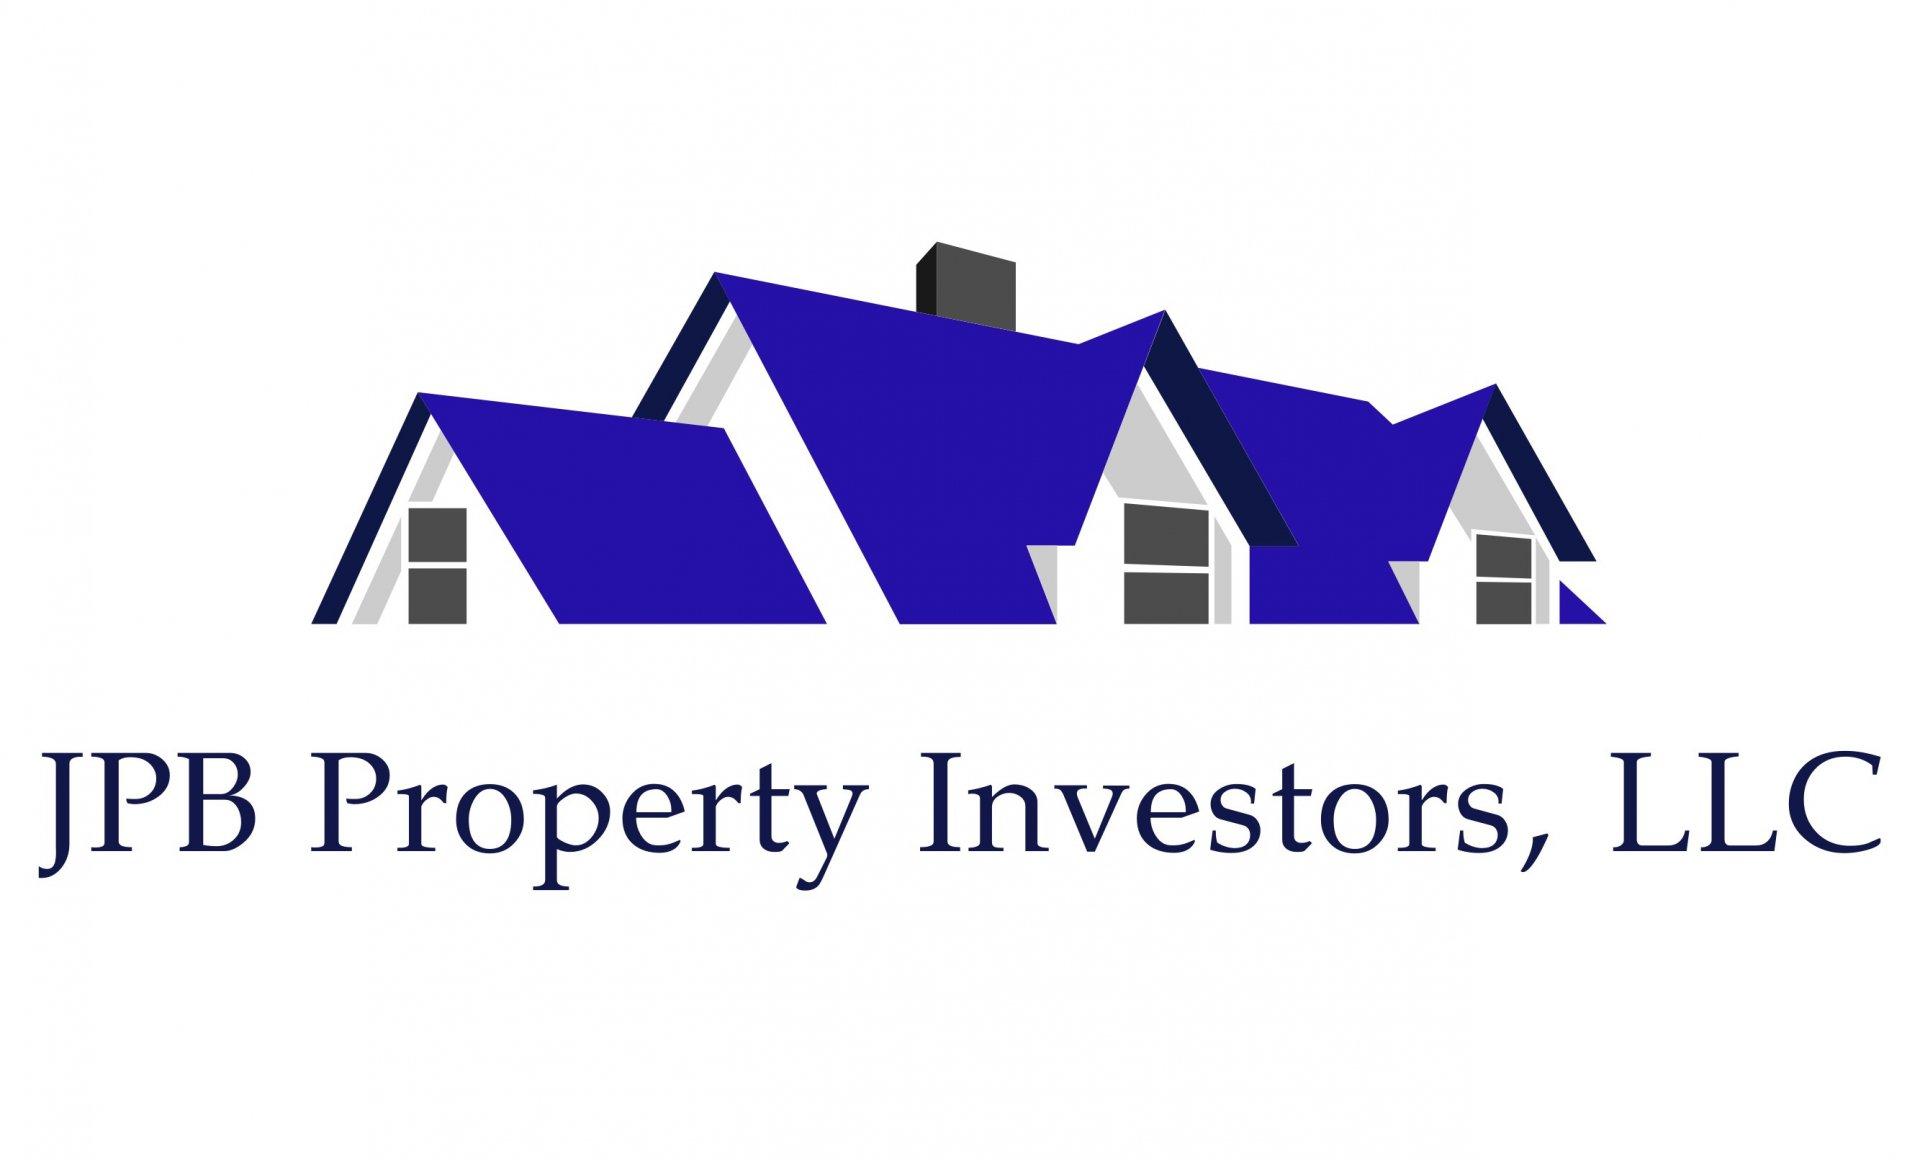 Owner Financed Homes in Jackson - JPB Property Investors, LLC